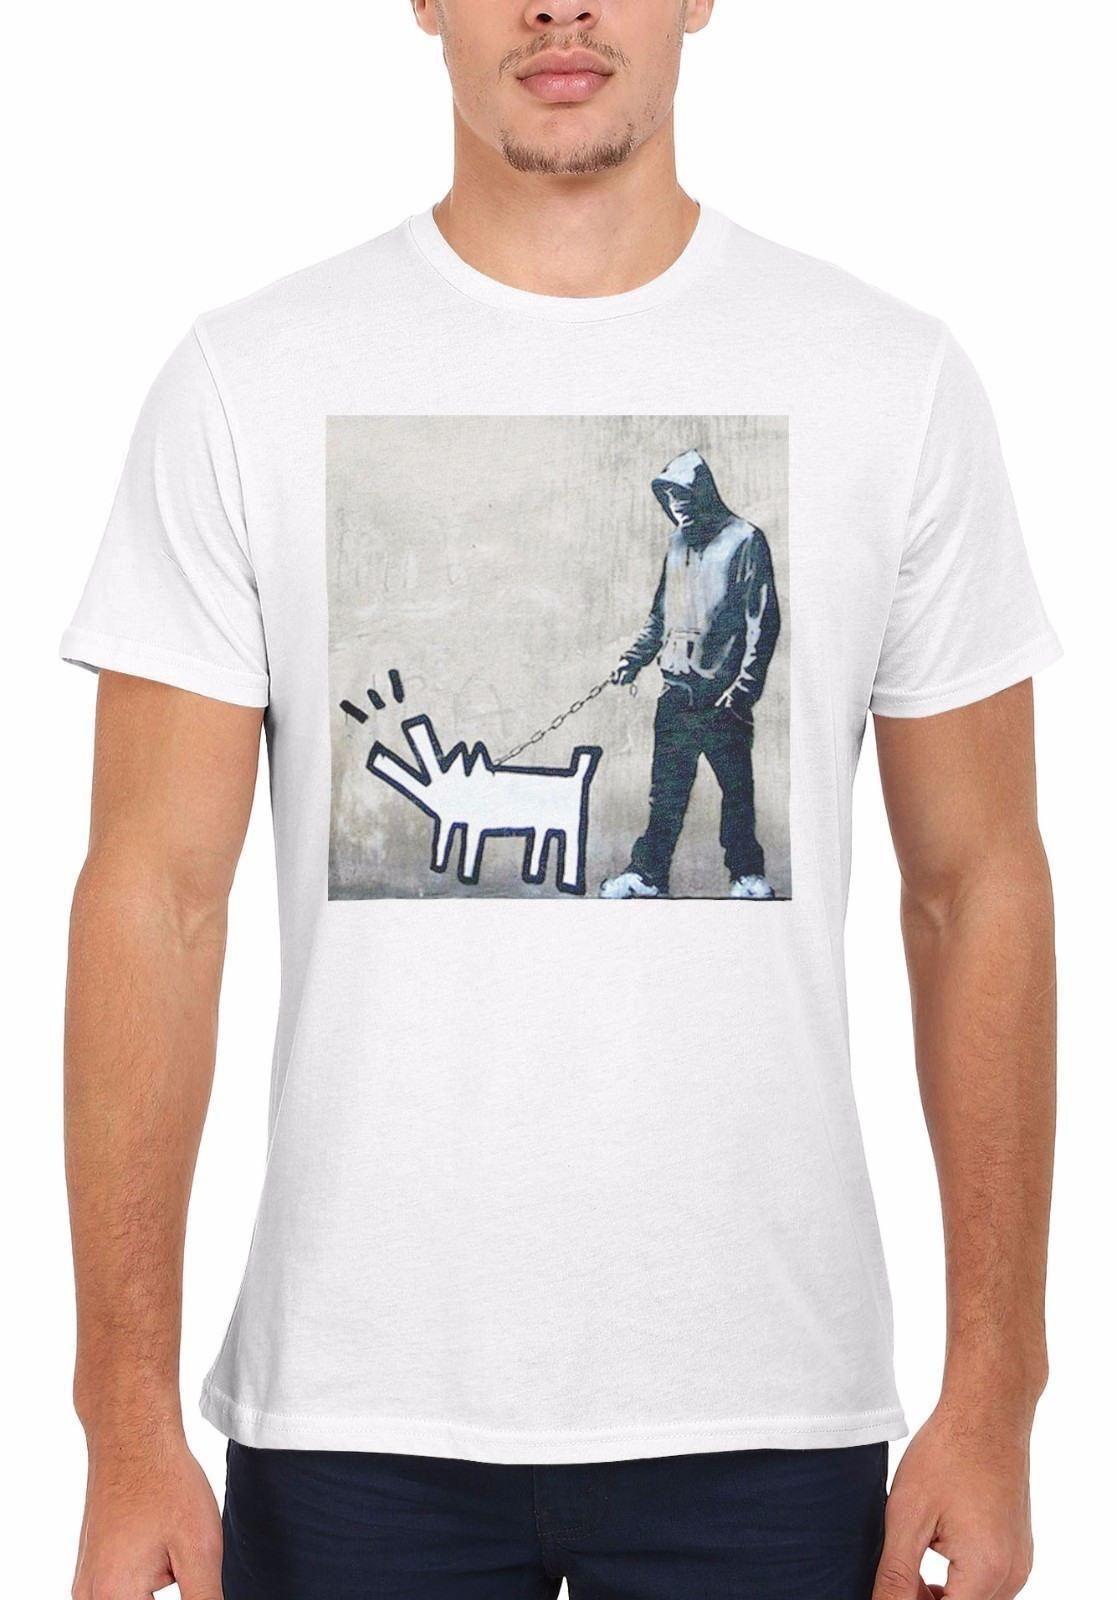 8aa375ae3b Banksy Keith Haring Dog Street Art Men Women Vest Tank Top Unisex T Shirt  1779 Funniest T Shirt Comical T Shirts From Linnan00003